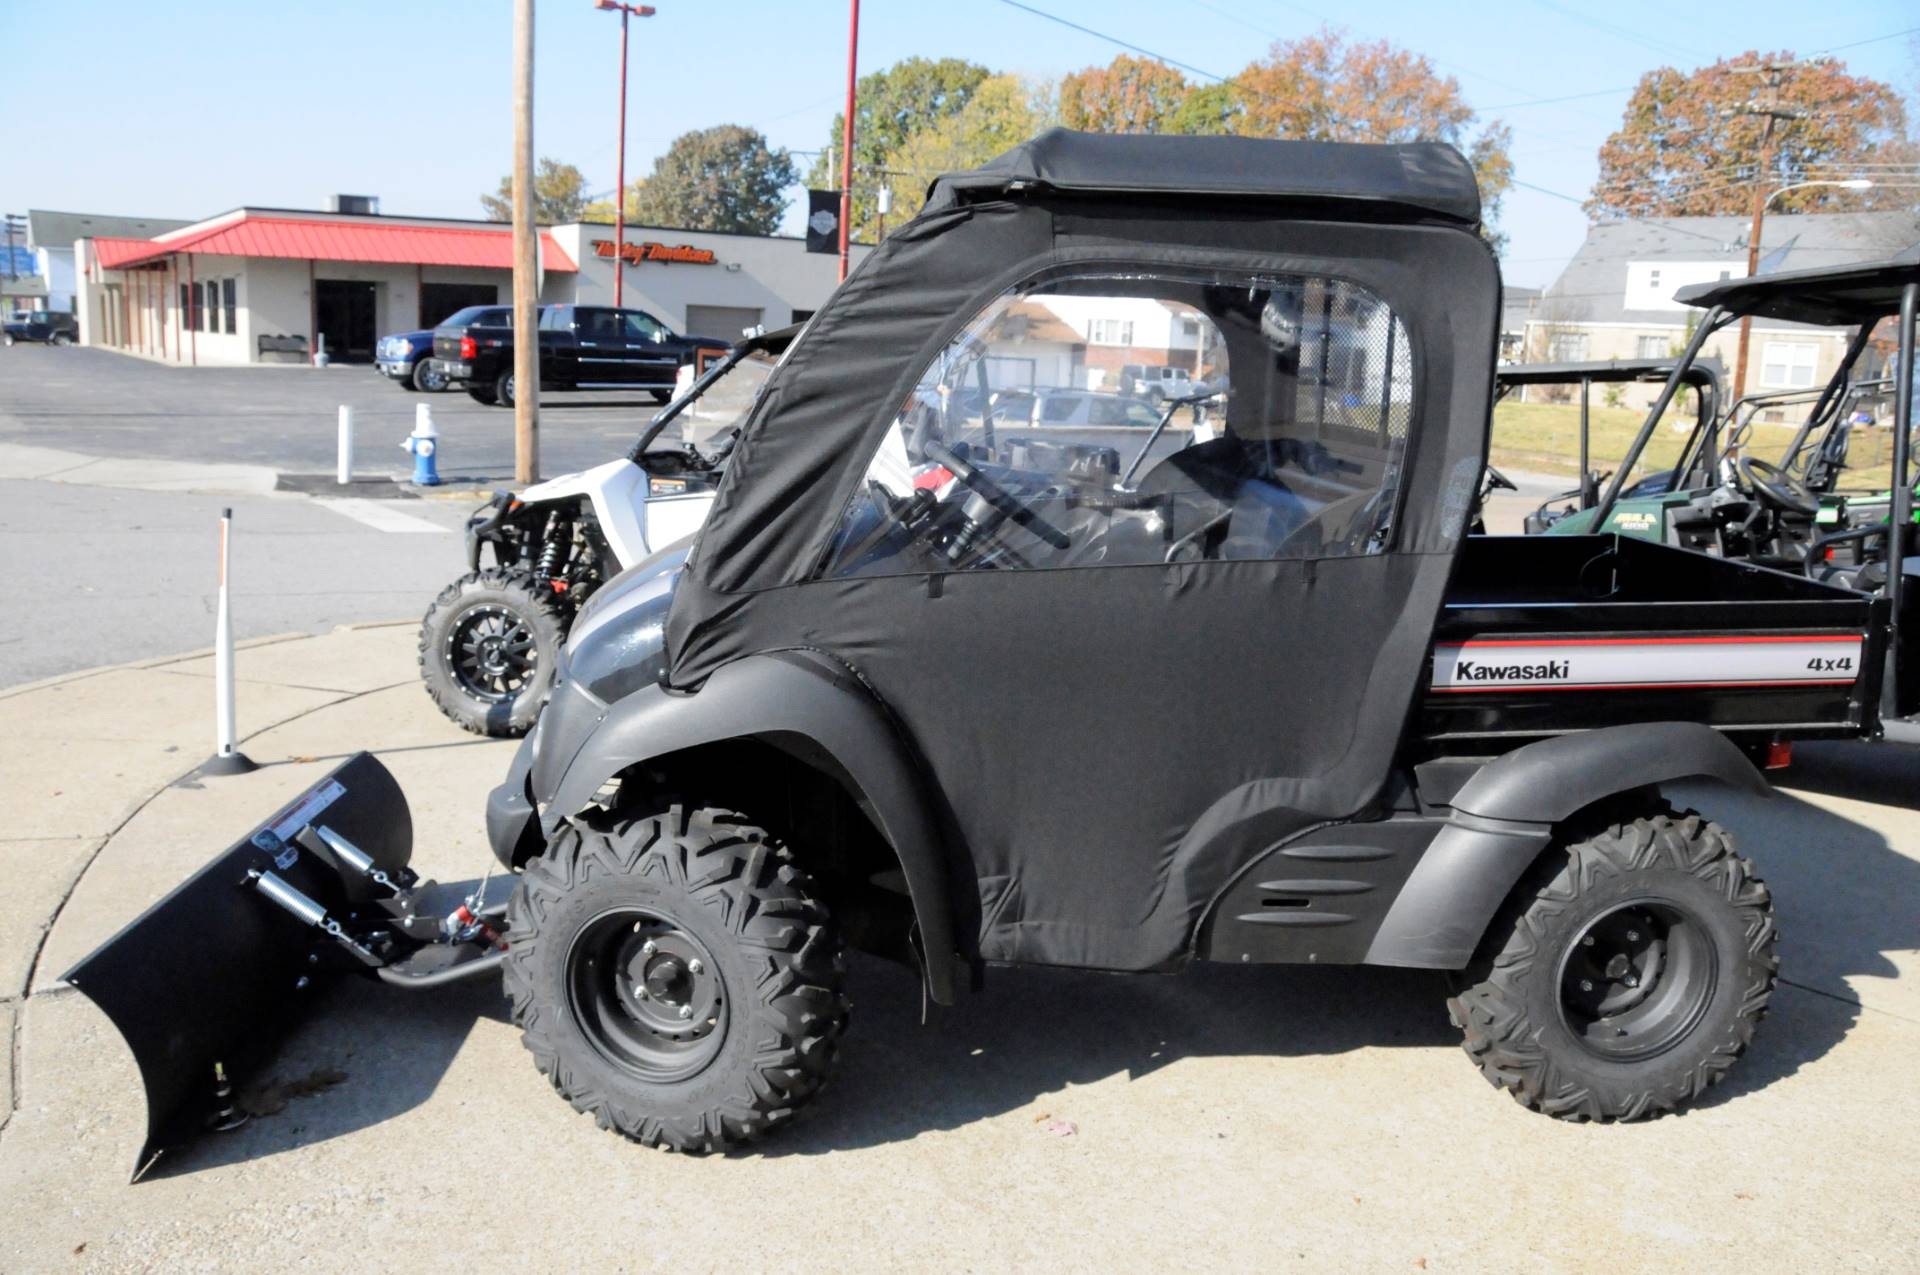 2016 Kawasaki Mule 610 4x4 XC in South Charleston, West Virginia